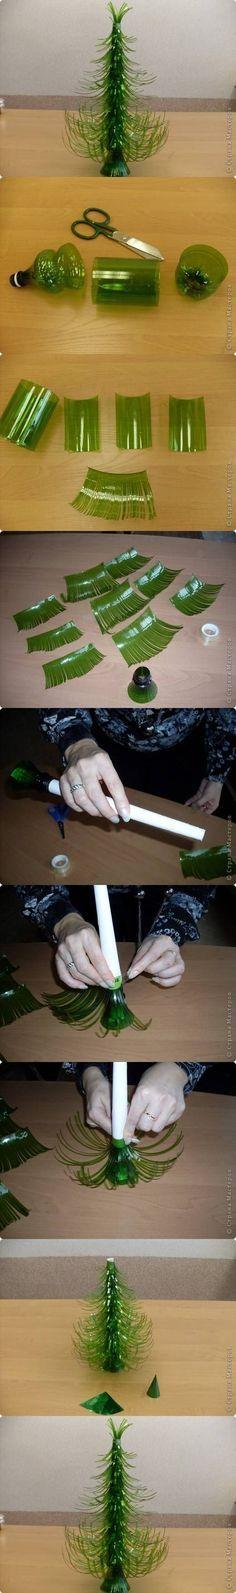 DIY Plastic Bottle Christmas Trees -- Cheap & Creative idea for dorm room…